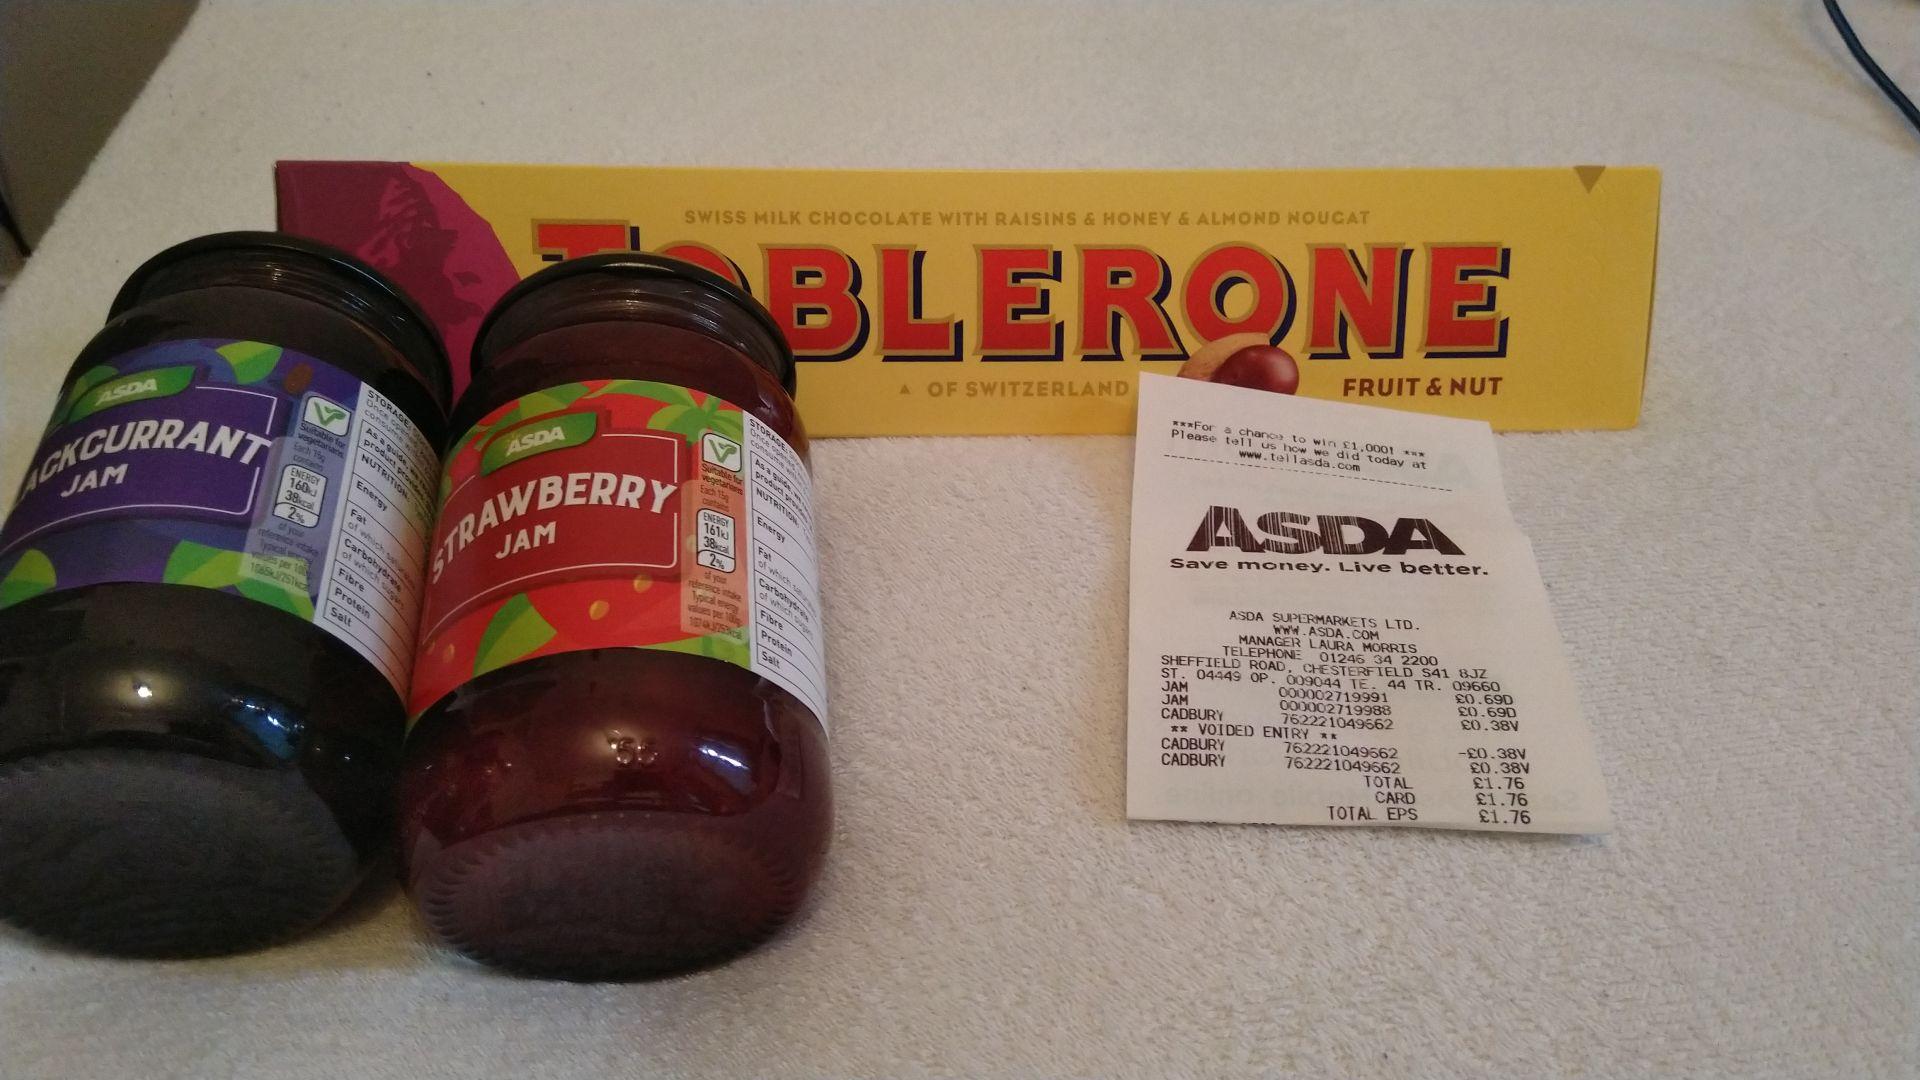 Toblerone scanning at 38p @ Asda in-store